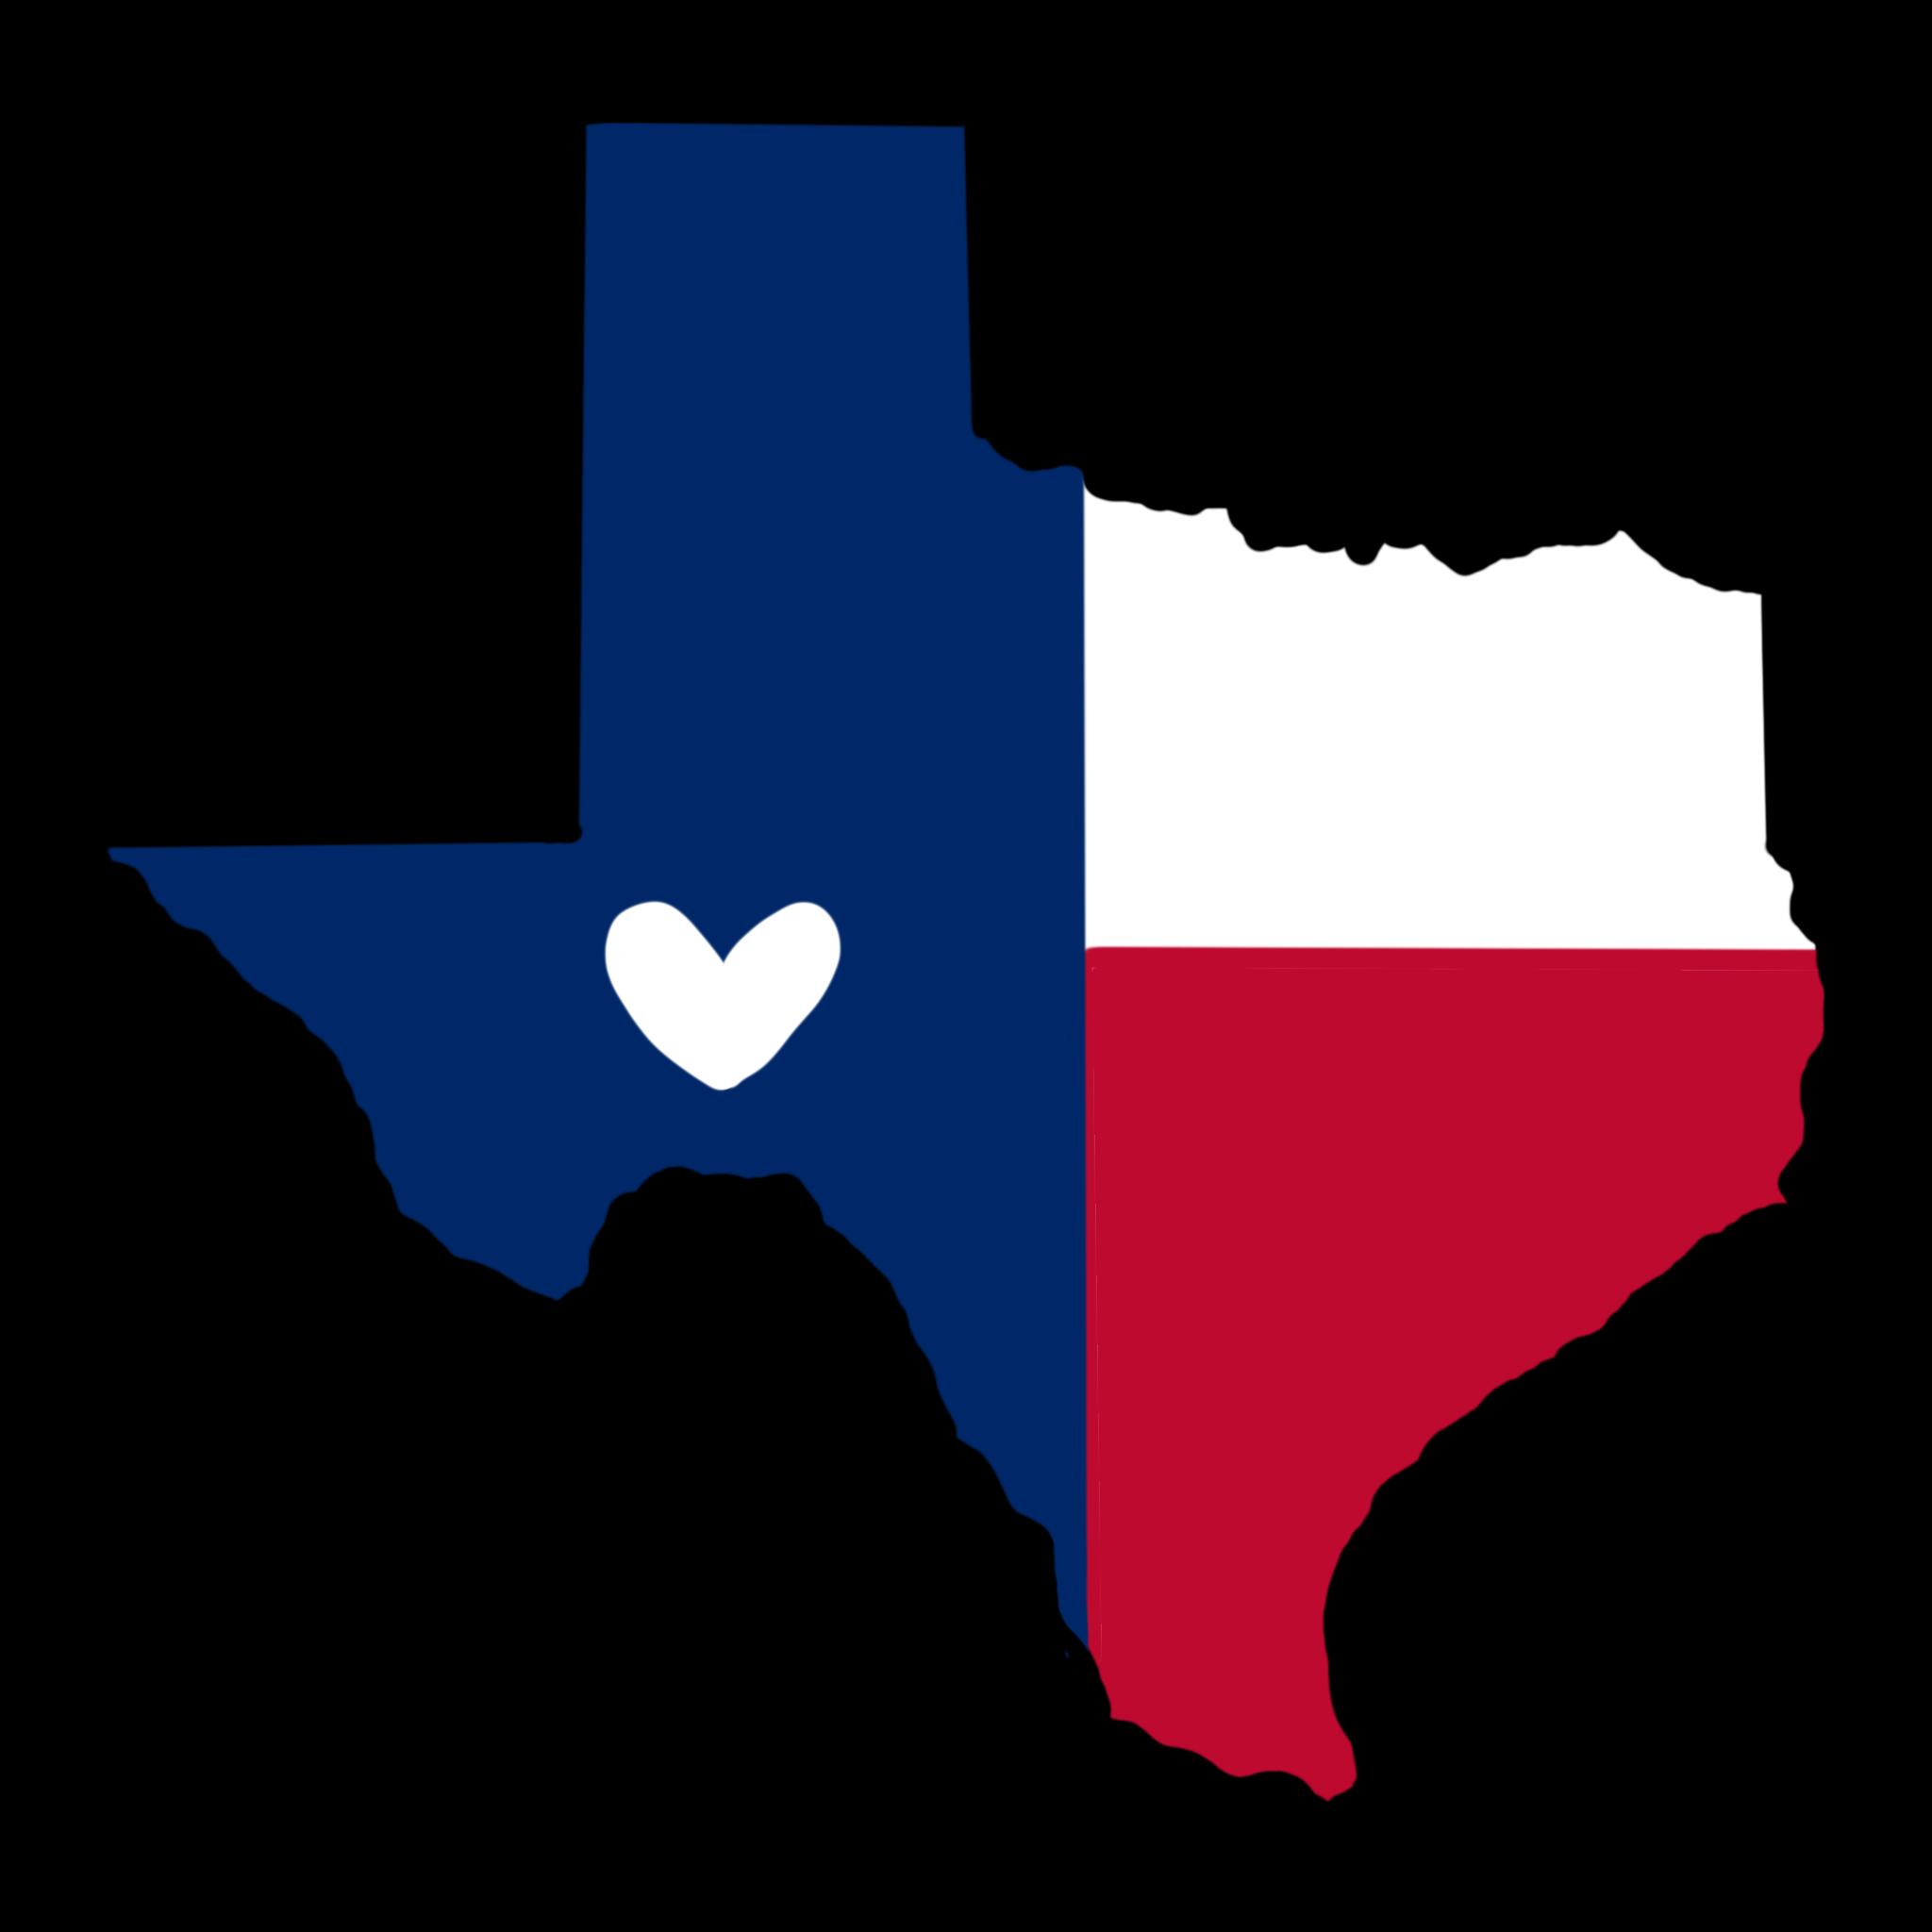 Donate money clipart vector stock Hurricane Harvey - How You Can Help • LoveKnitting Blog vector stock